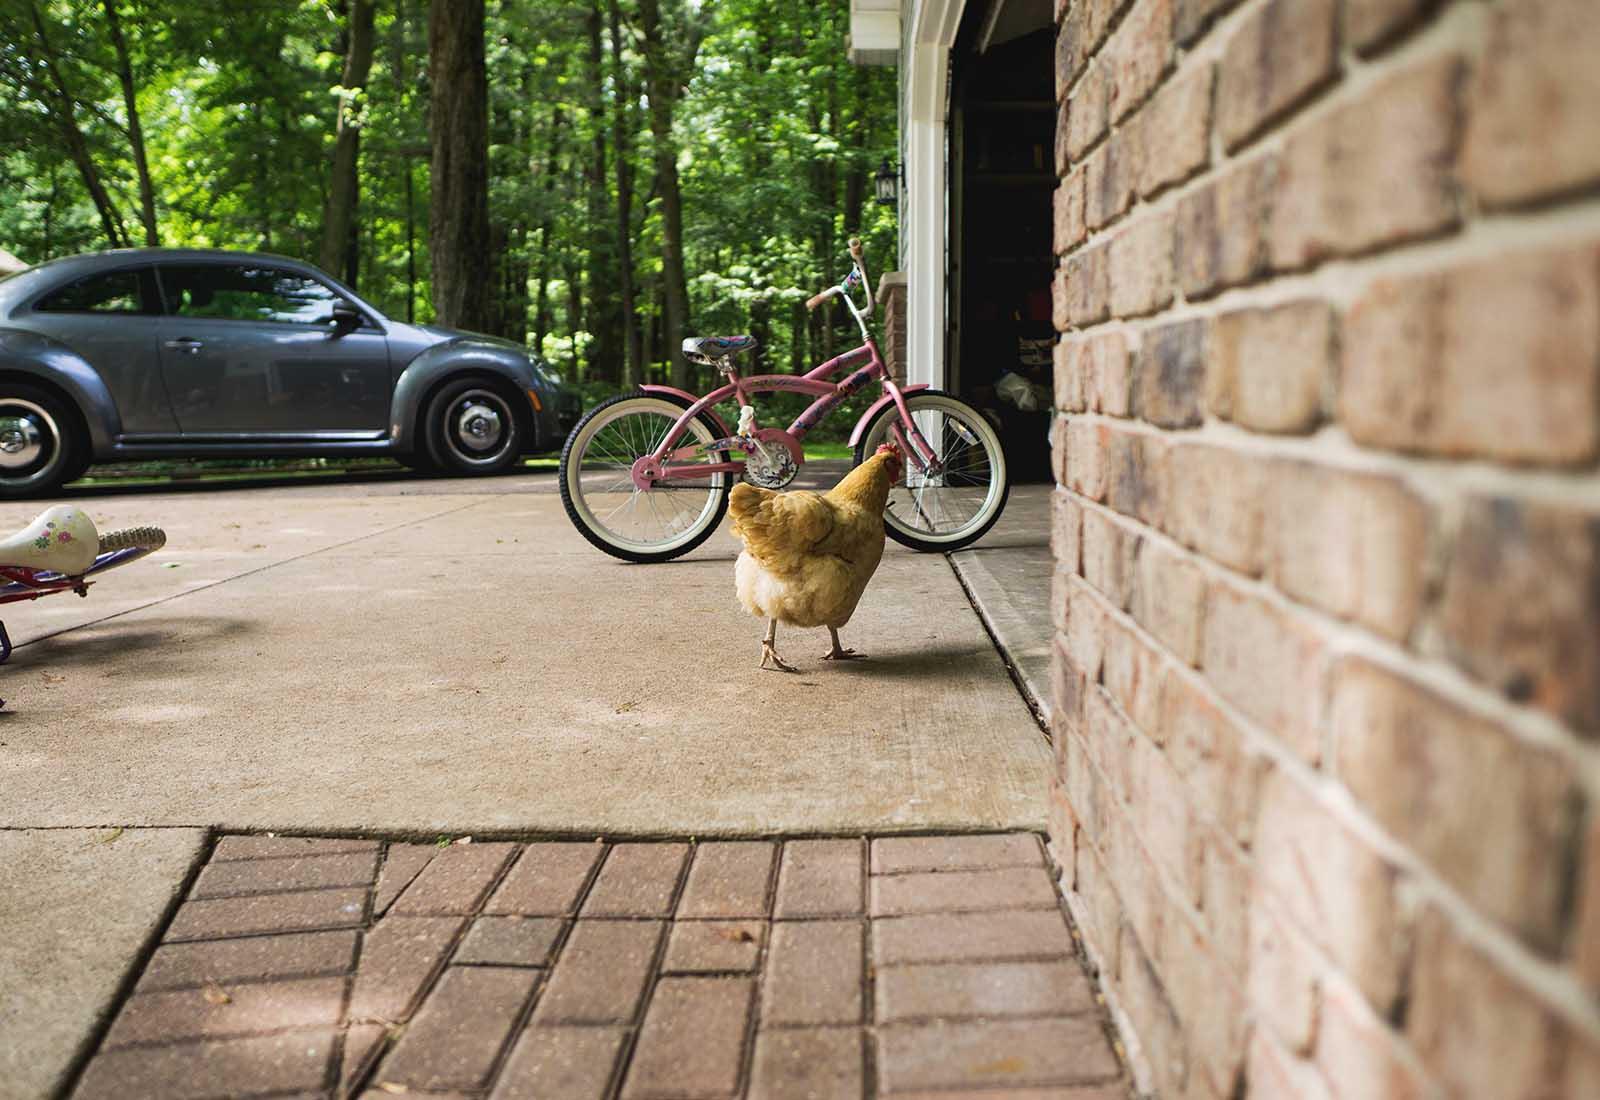 A chicken walks into a garage by Elizabeth Ordonez